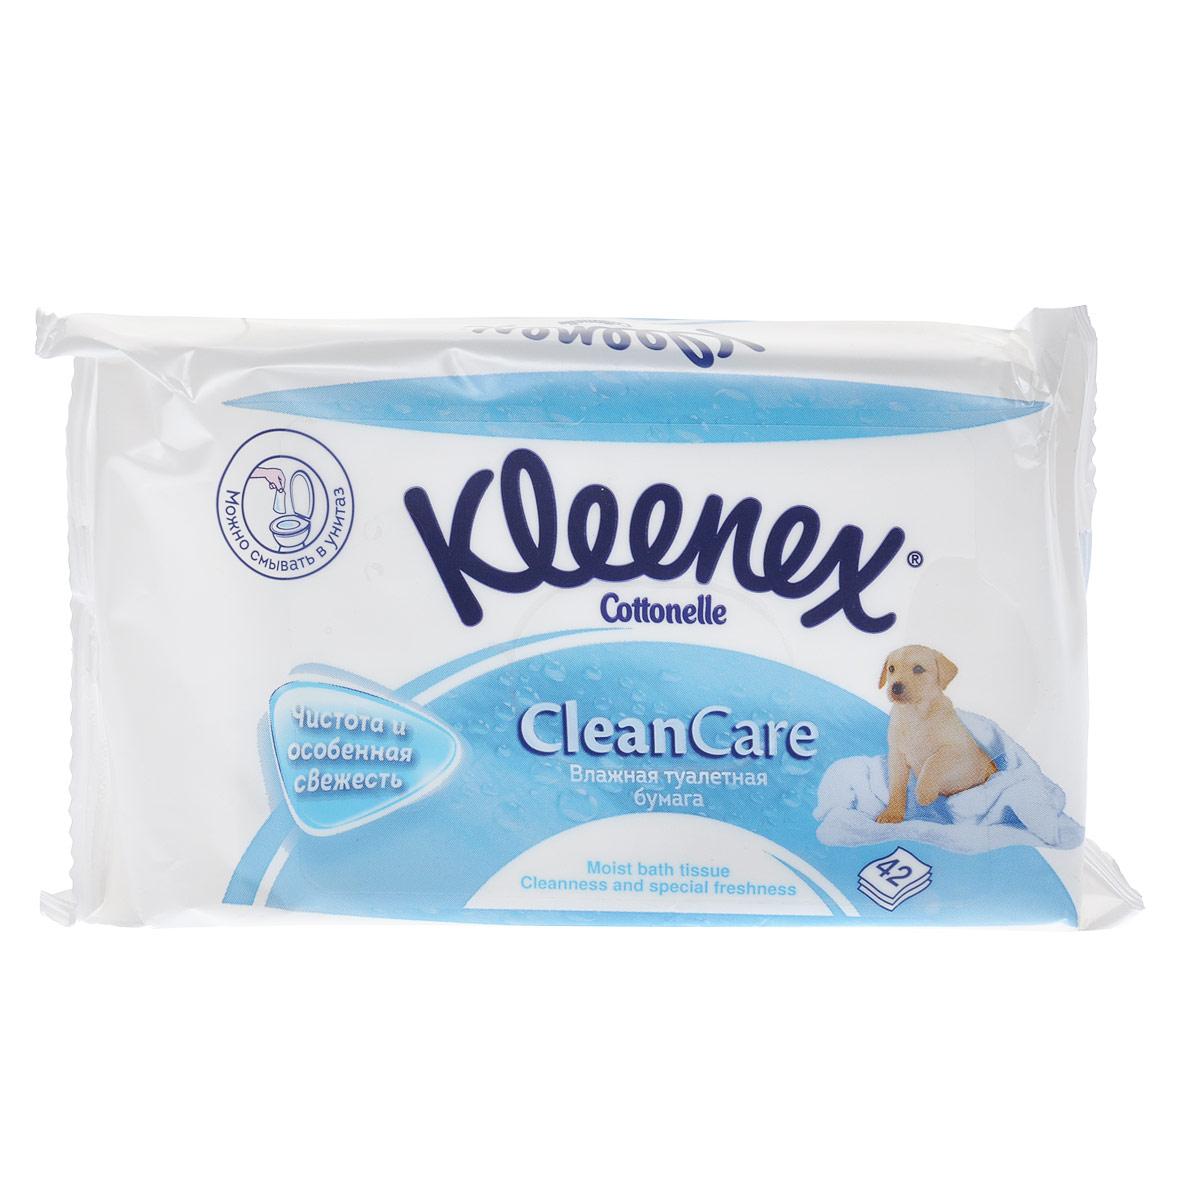 Kleenex Туалетная бумага Clean Care, влажная, сменный блок, 42 шт fria влажная туалетная бумага umidificata sensitive care био разлогаемая 12 шт уп